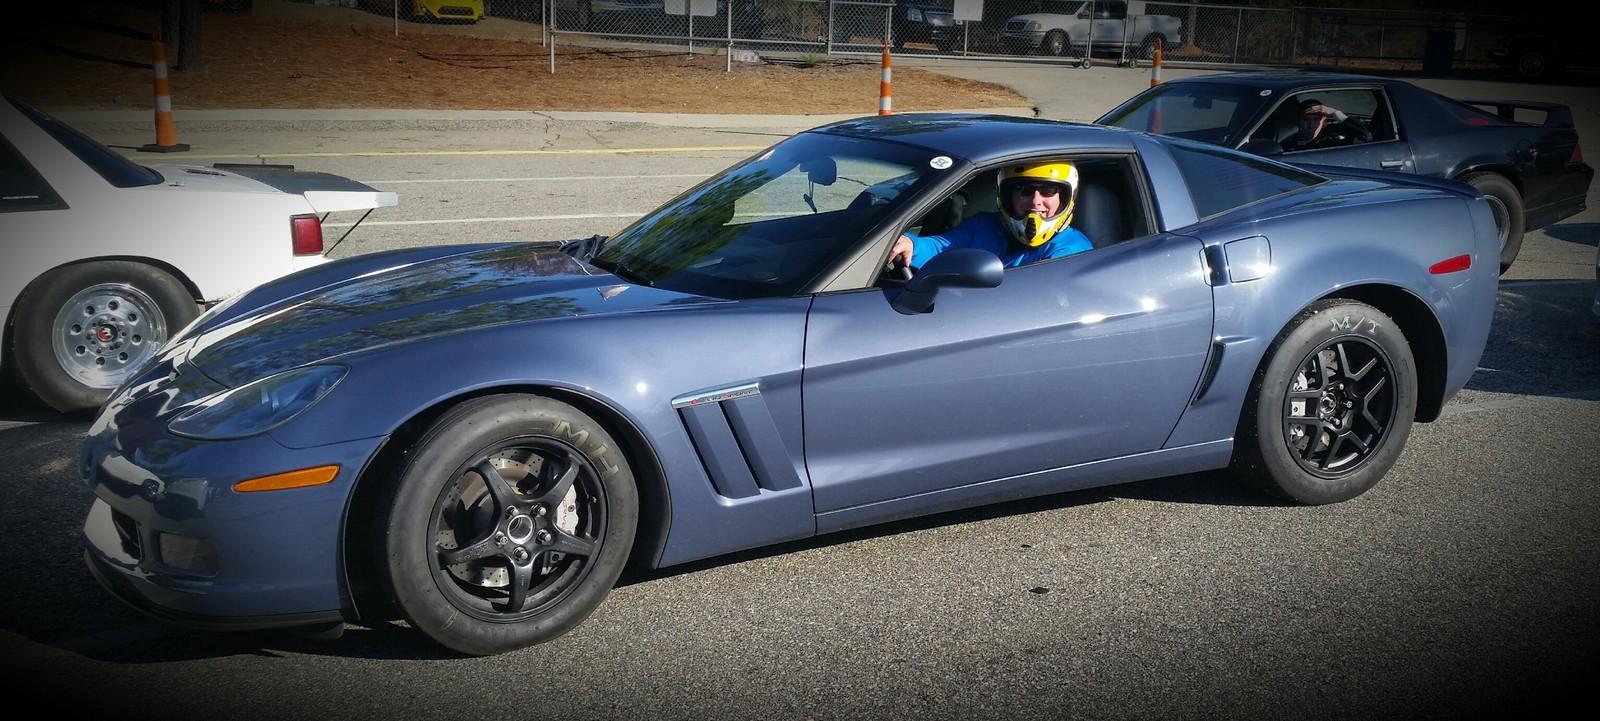 corvette 2012 grand sport 0 to autos post. Black Bedroom Furniture Sets. Home Design Ideas